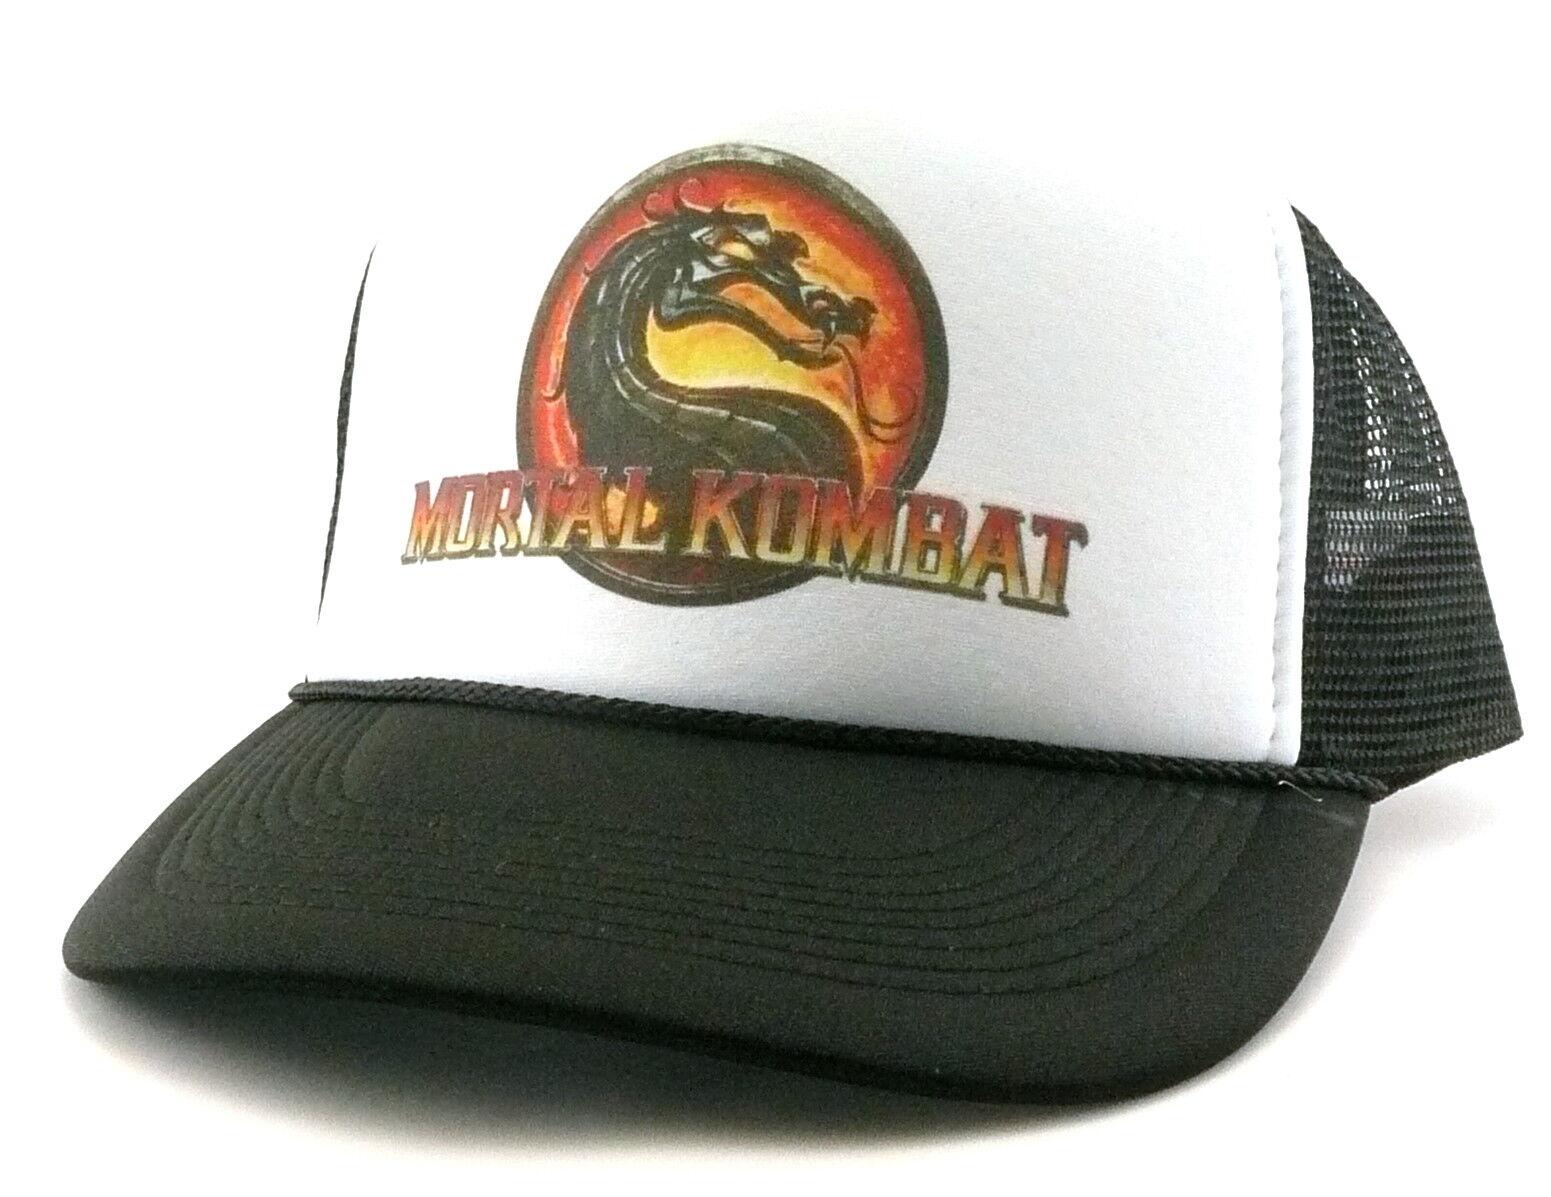 0541cb1259ad3 Vintage Mortal Kombat Trucker Hat mesh hat black new video game hat 1990 s